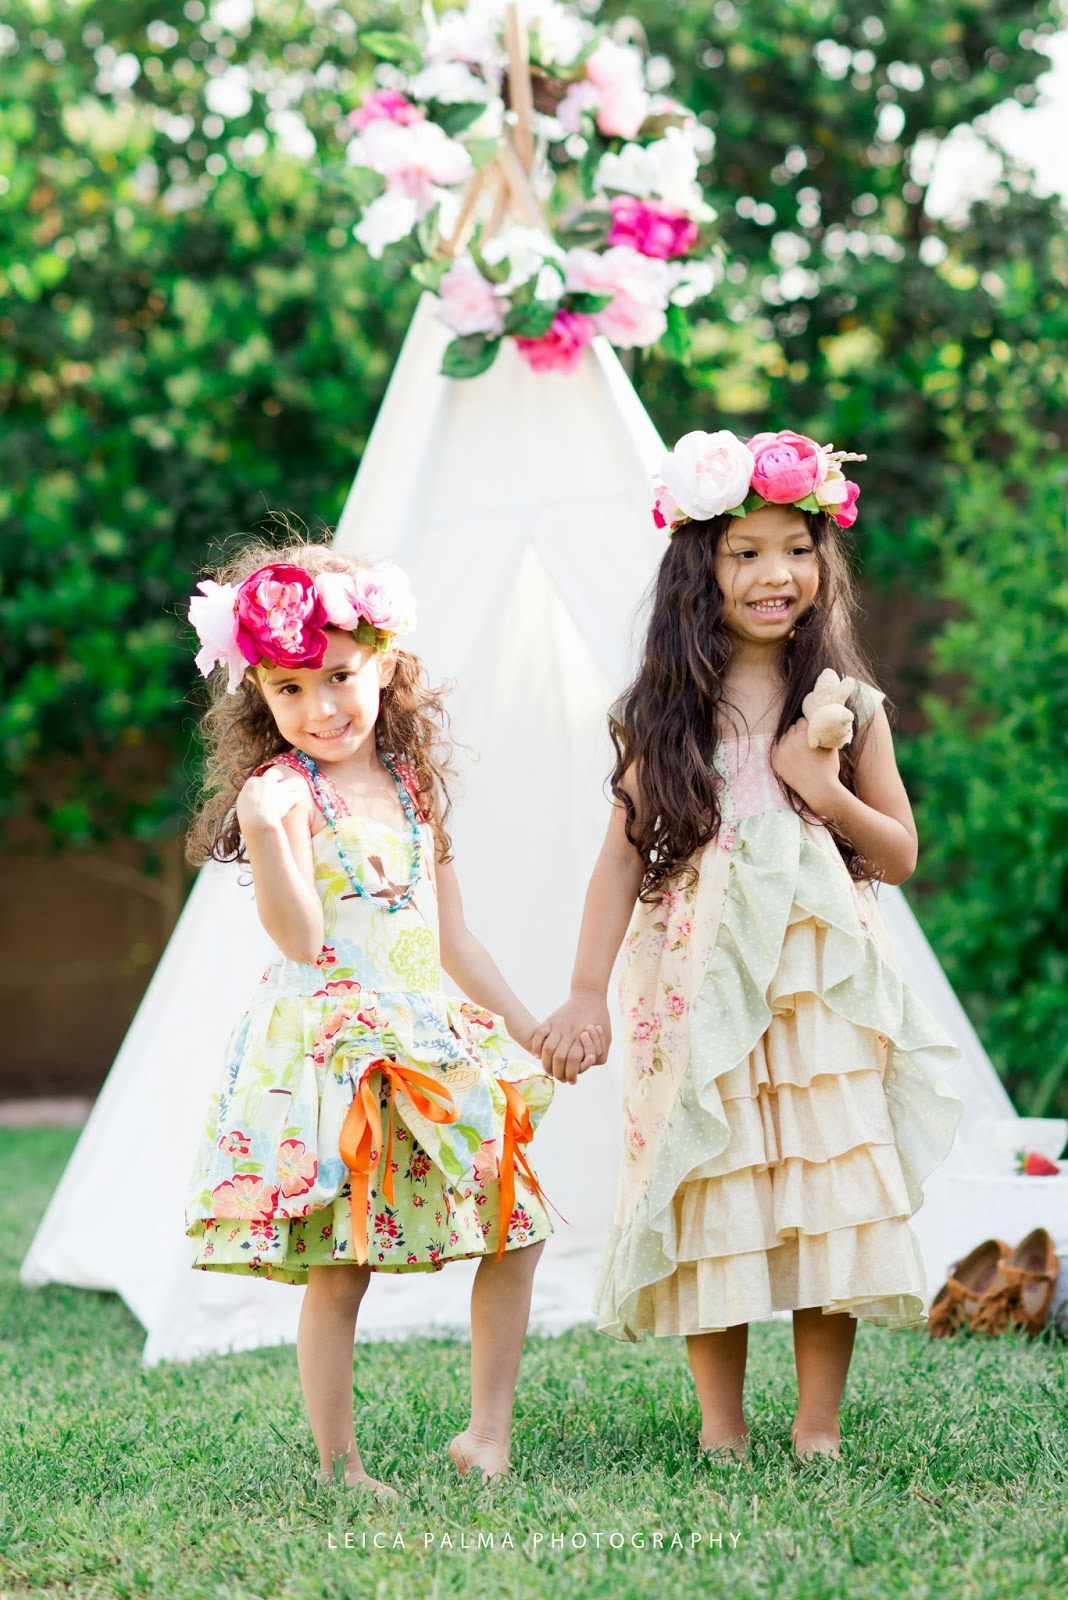 tea party dress up clothes party dresses dressesss. Black Bedroom Furniture Sets. Home Design Ideas